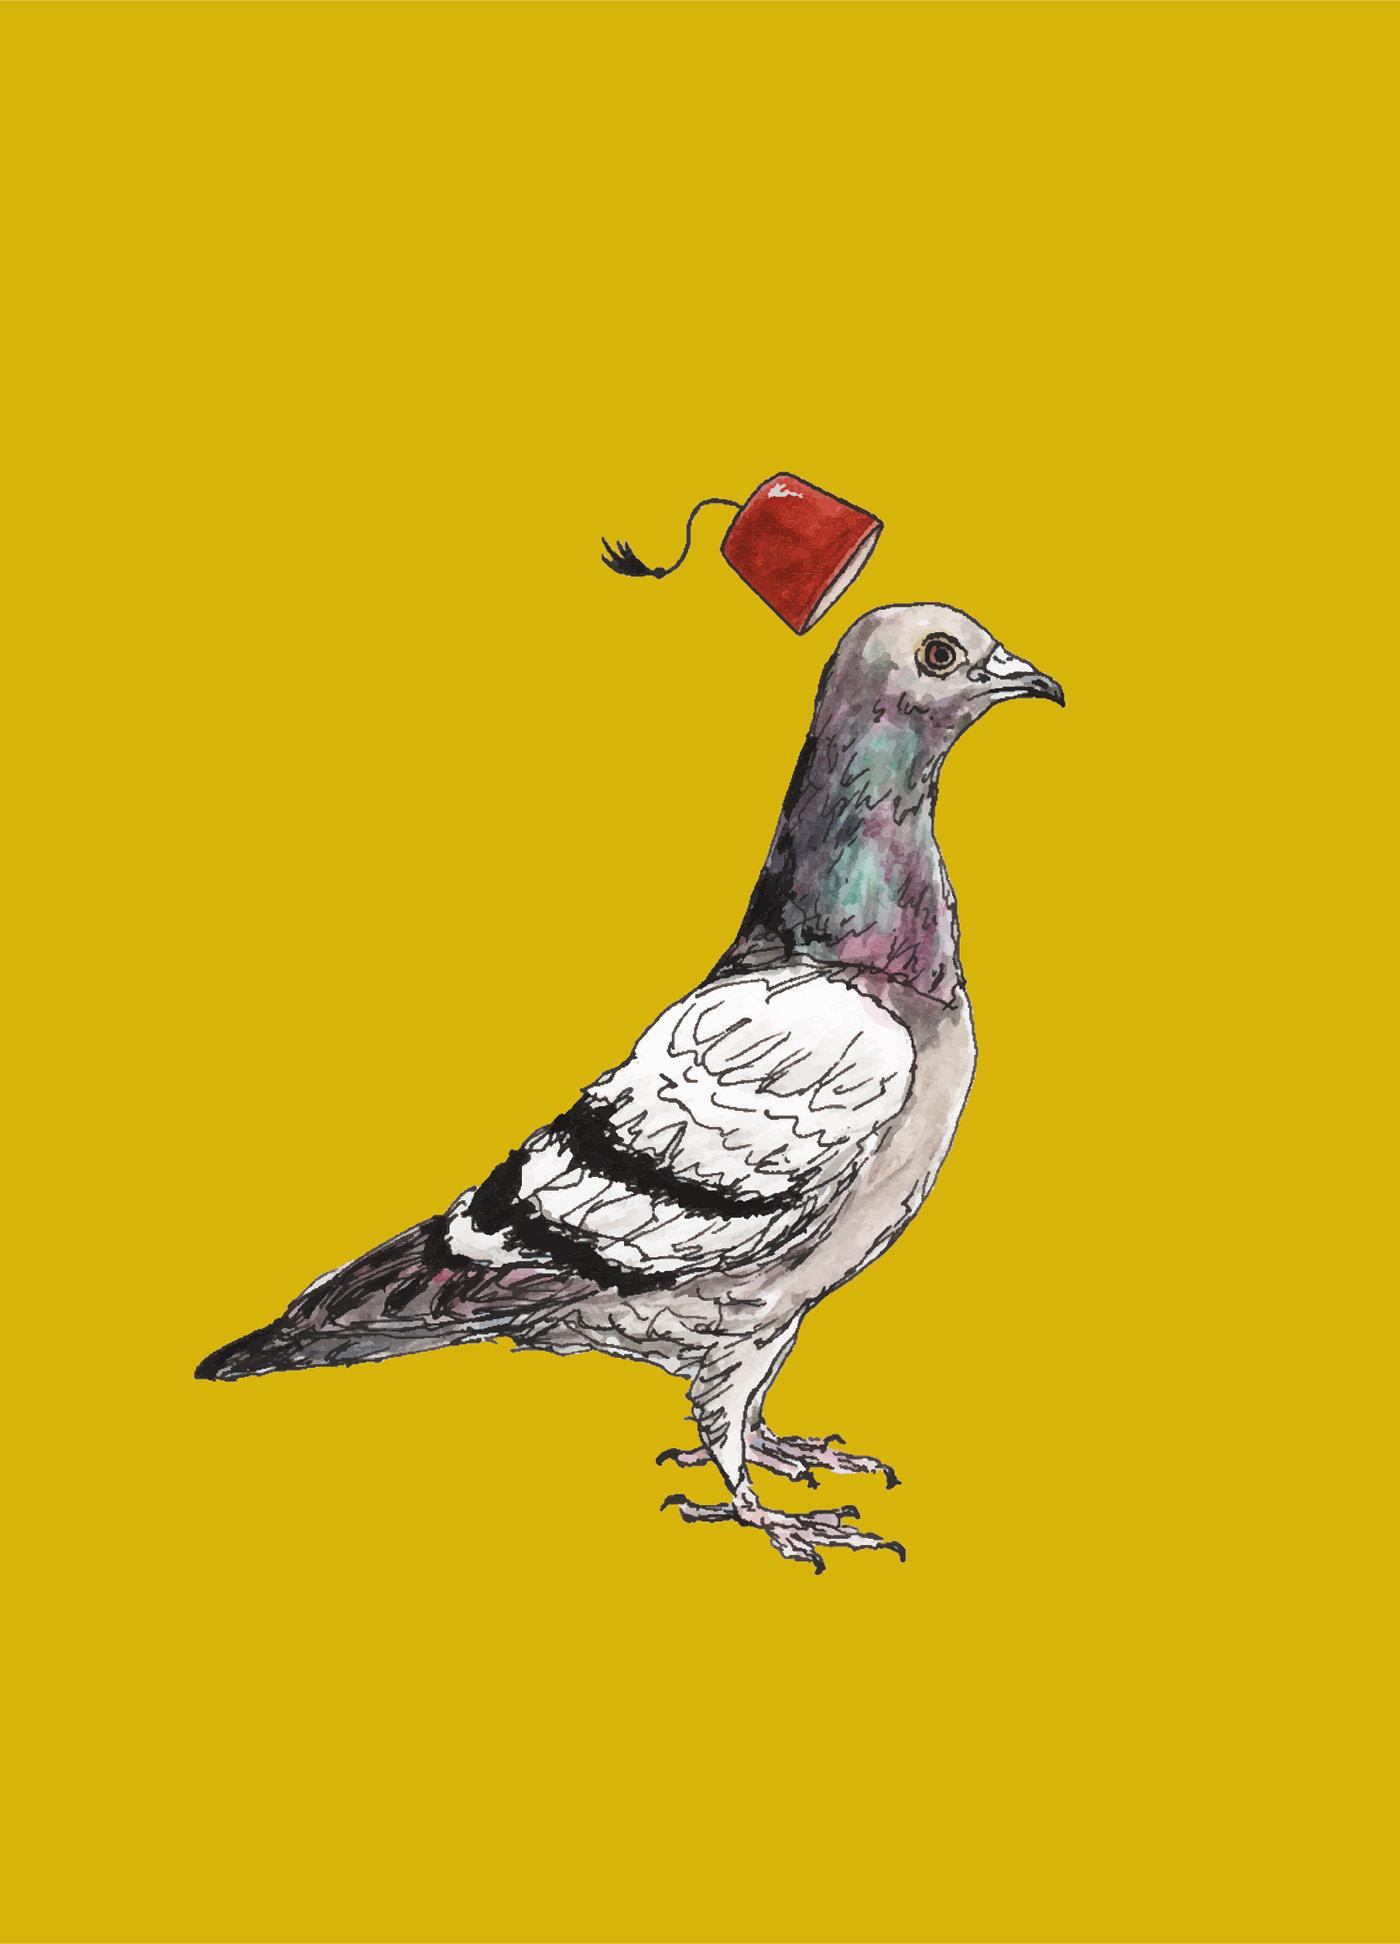 Image may contain: bird, animal and drawing